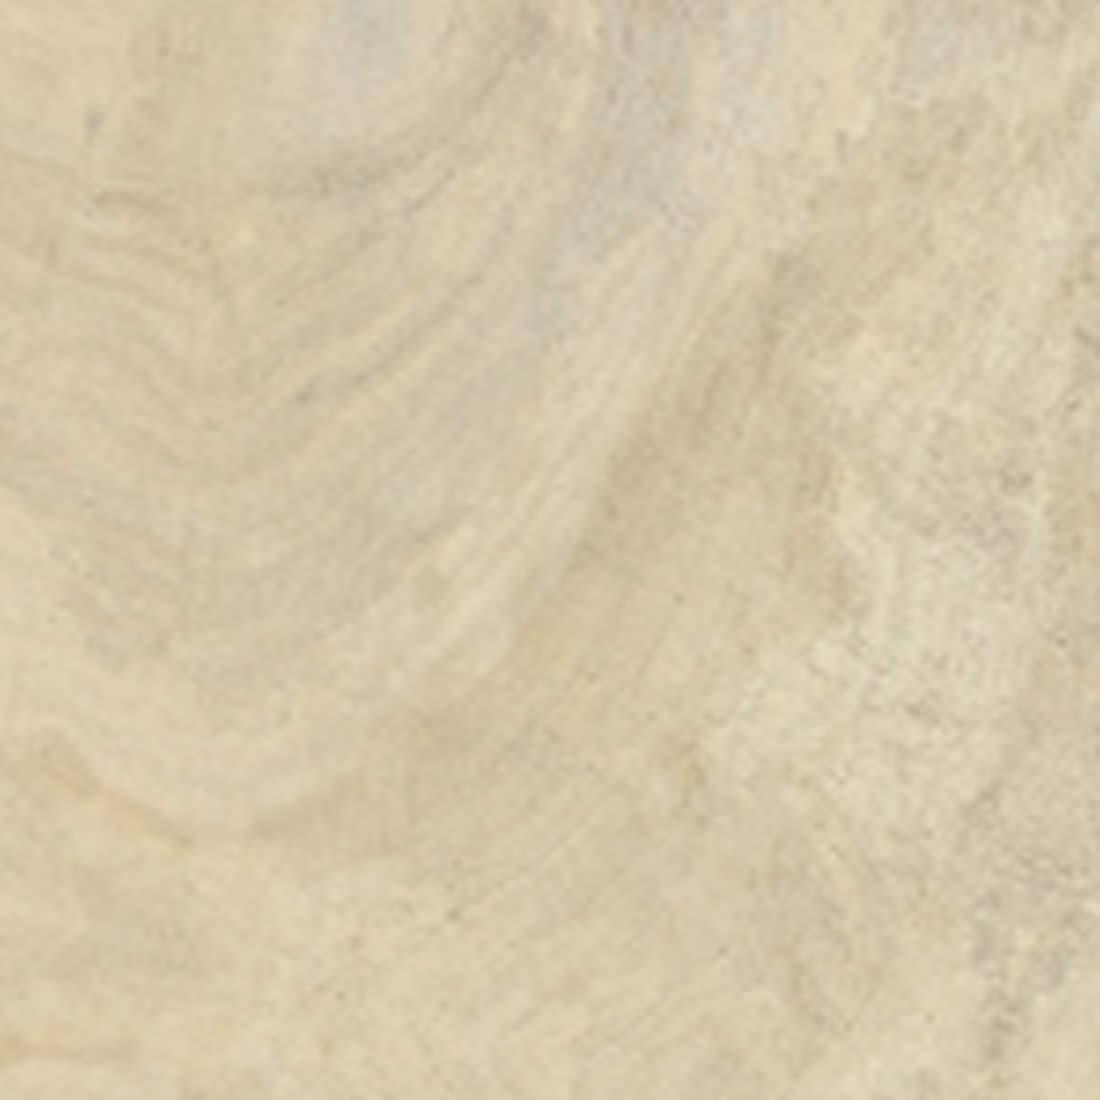 Porcelanato Delta Jequitiba Claro Polido 70x70 Borda Reta